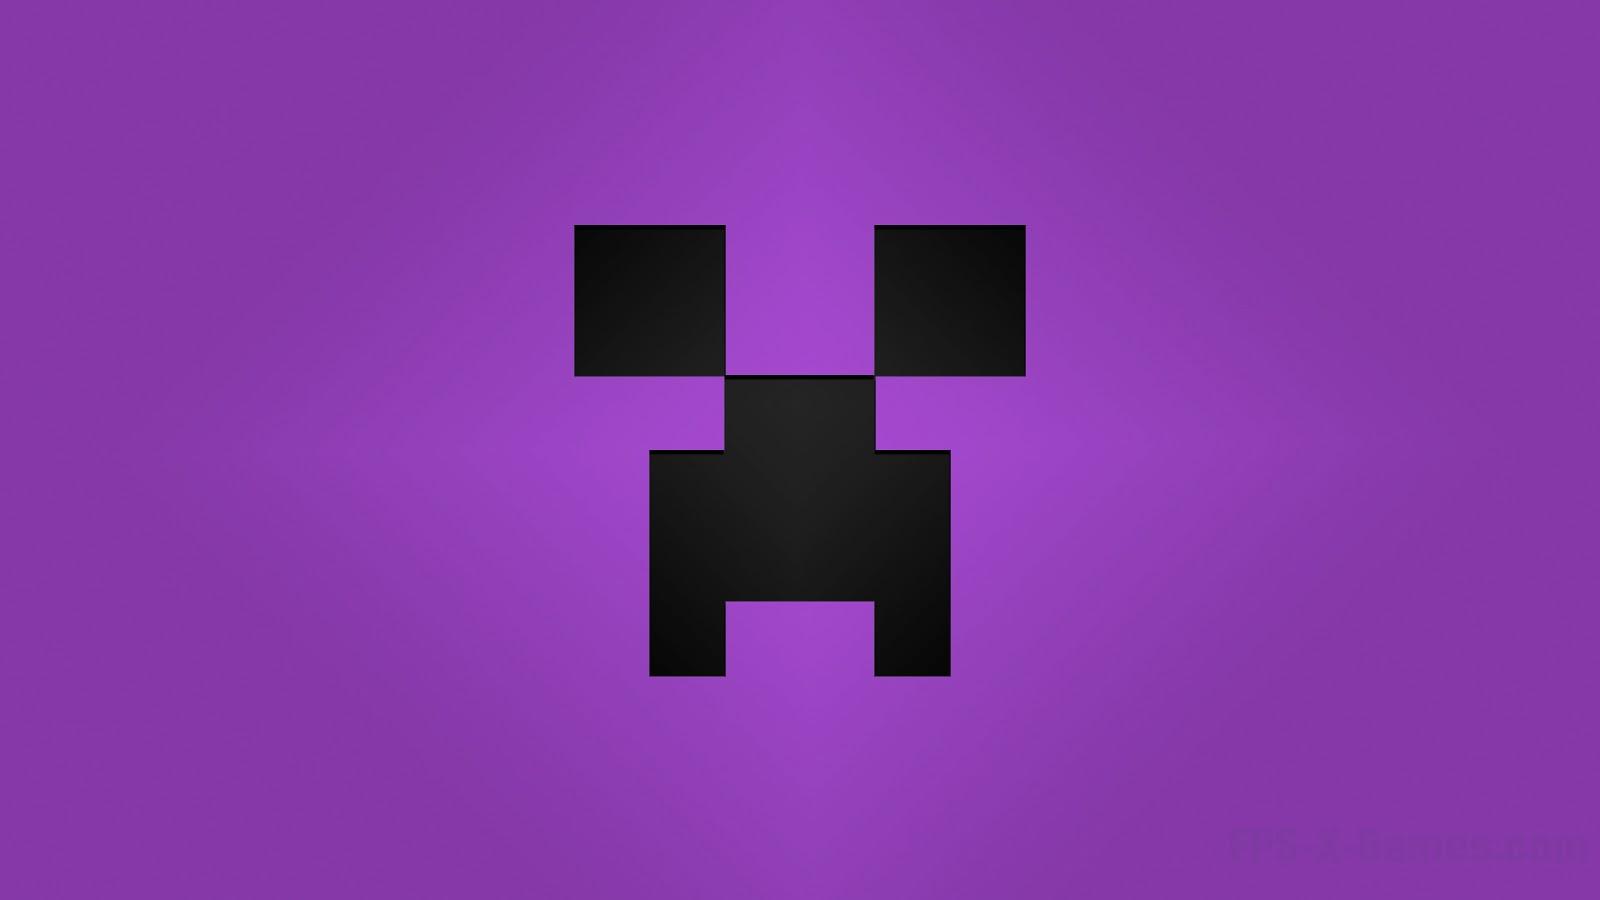 Minecraft Creeper Desktop Wallpapers Purple